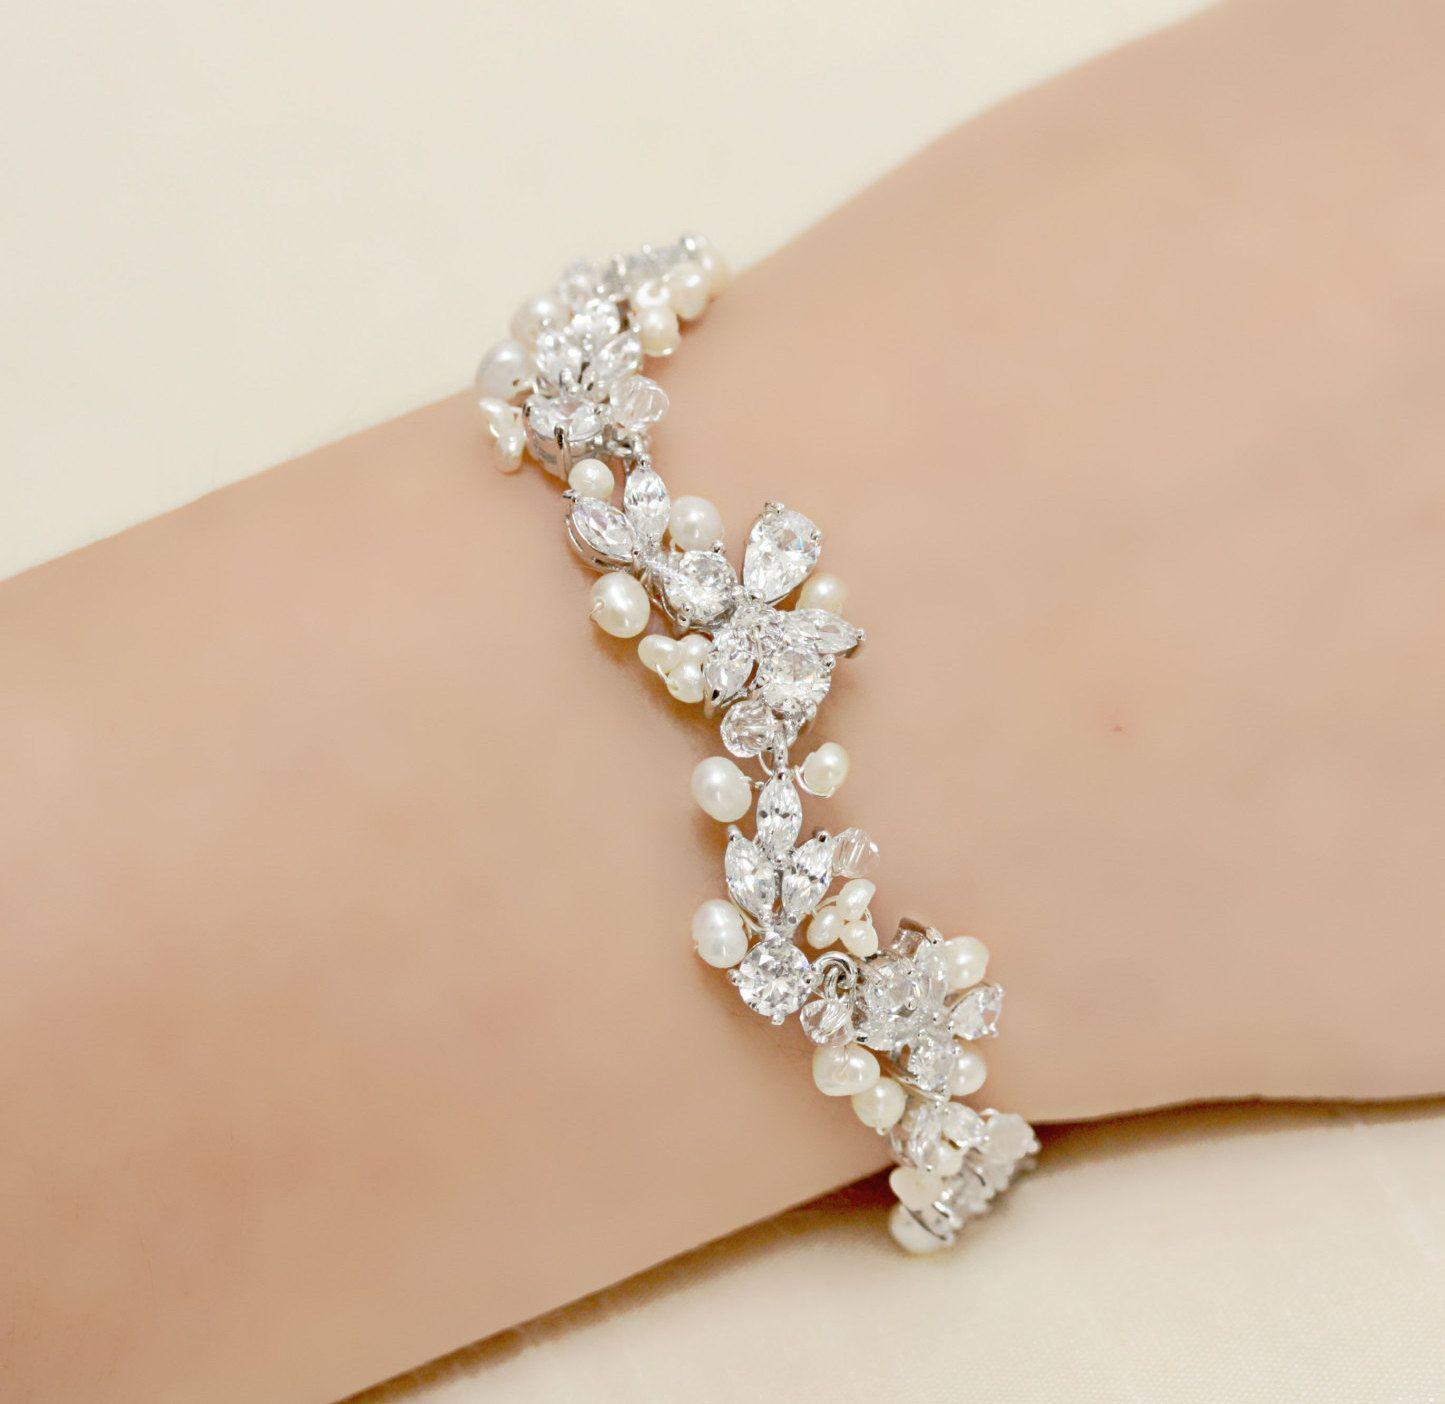 Delicate Wedding Jewelry Rhinestone Freshwater Pearl And Swarovski Crystal Bridal Bracelet